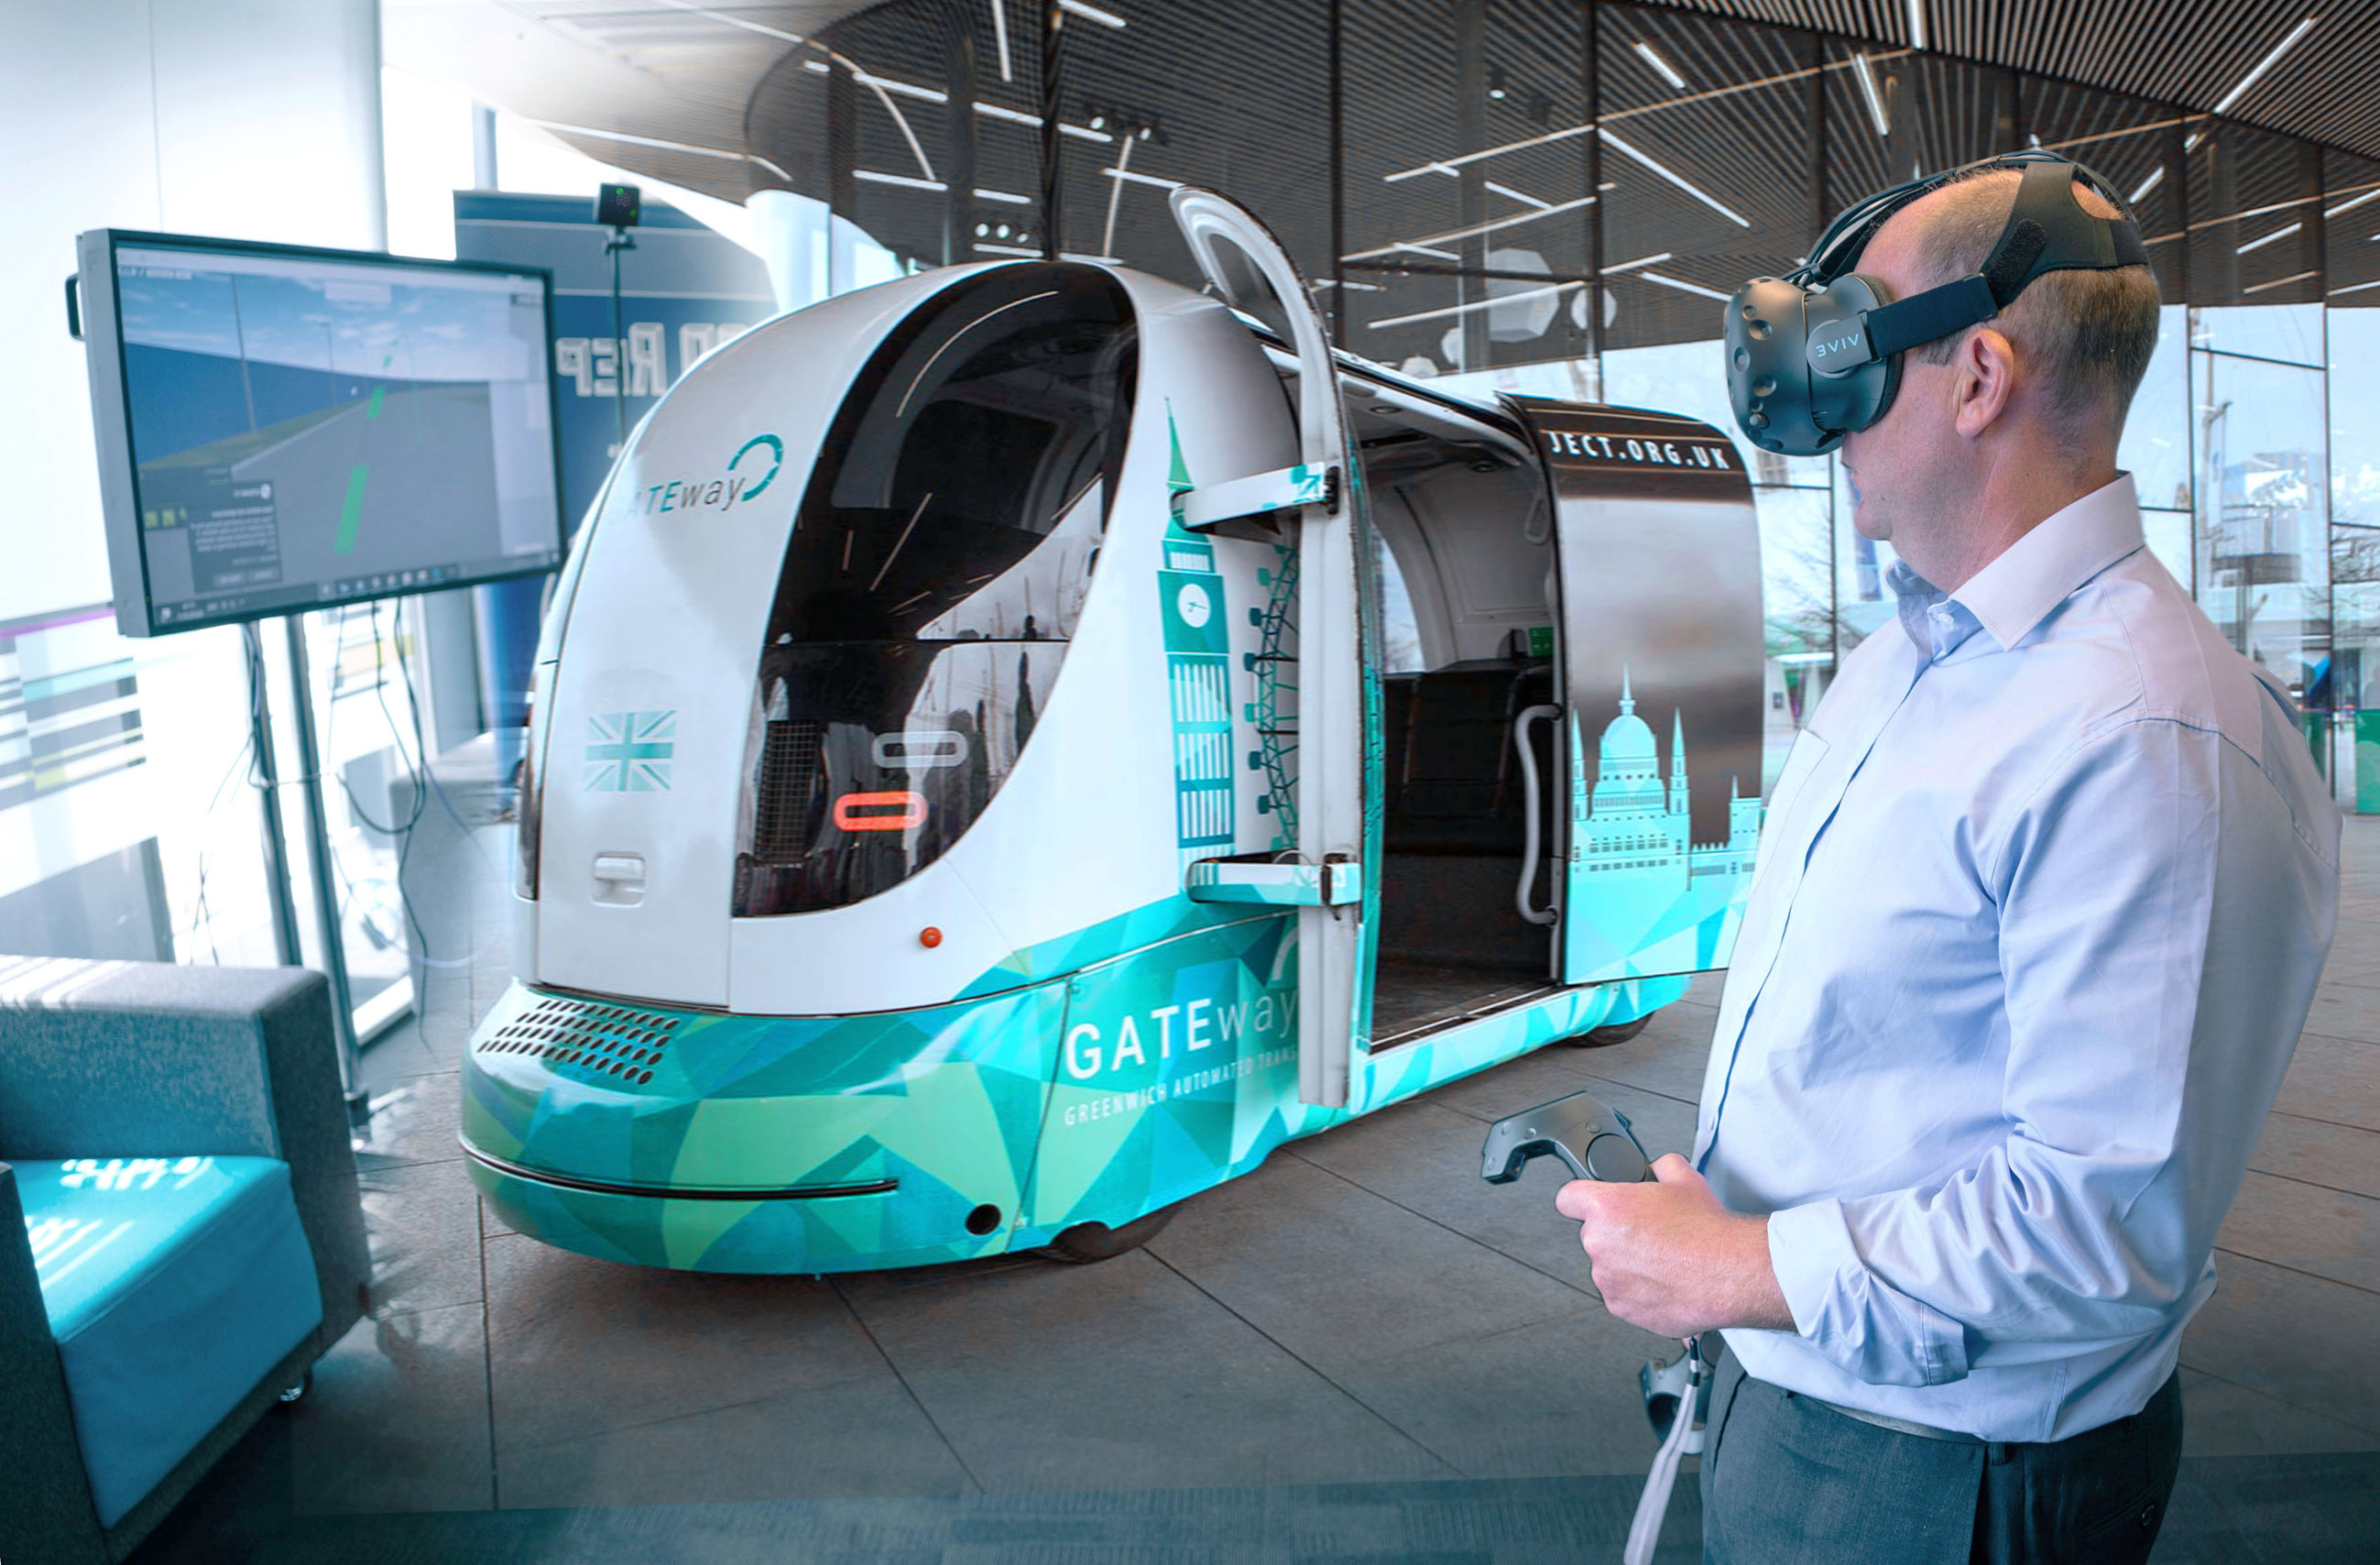 3D Virtual Reality visualizations